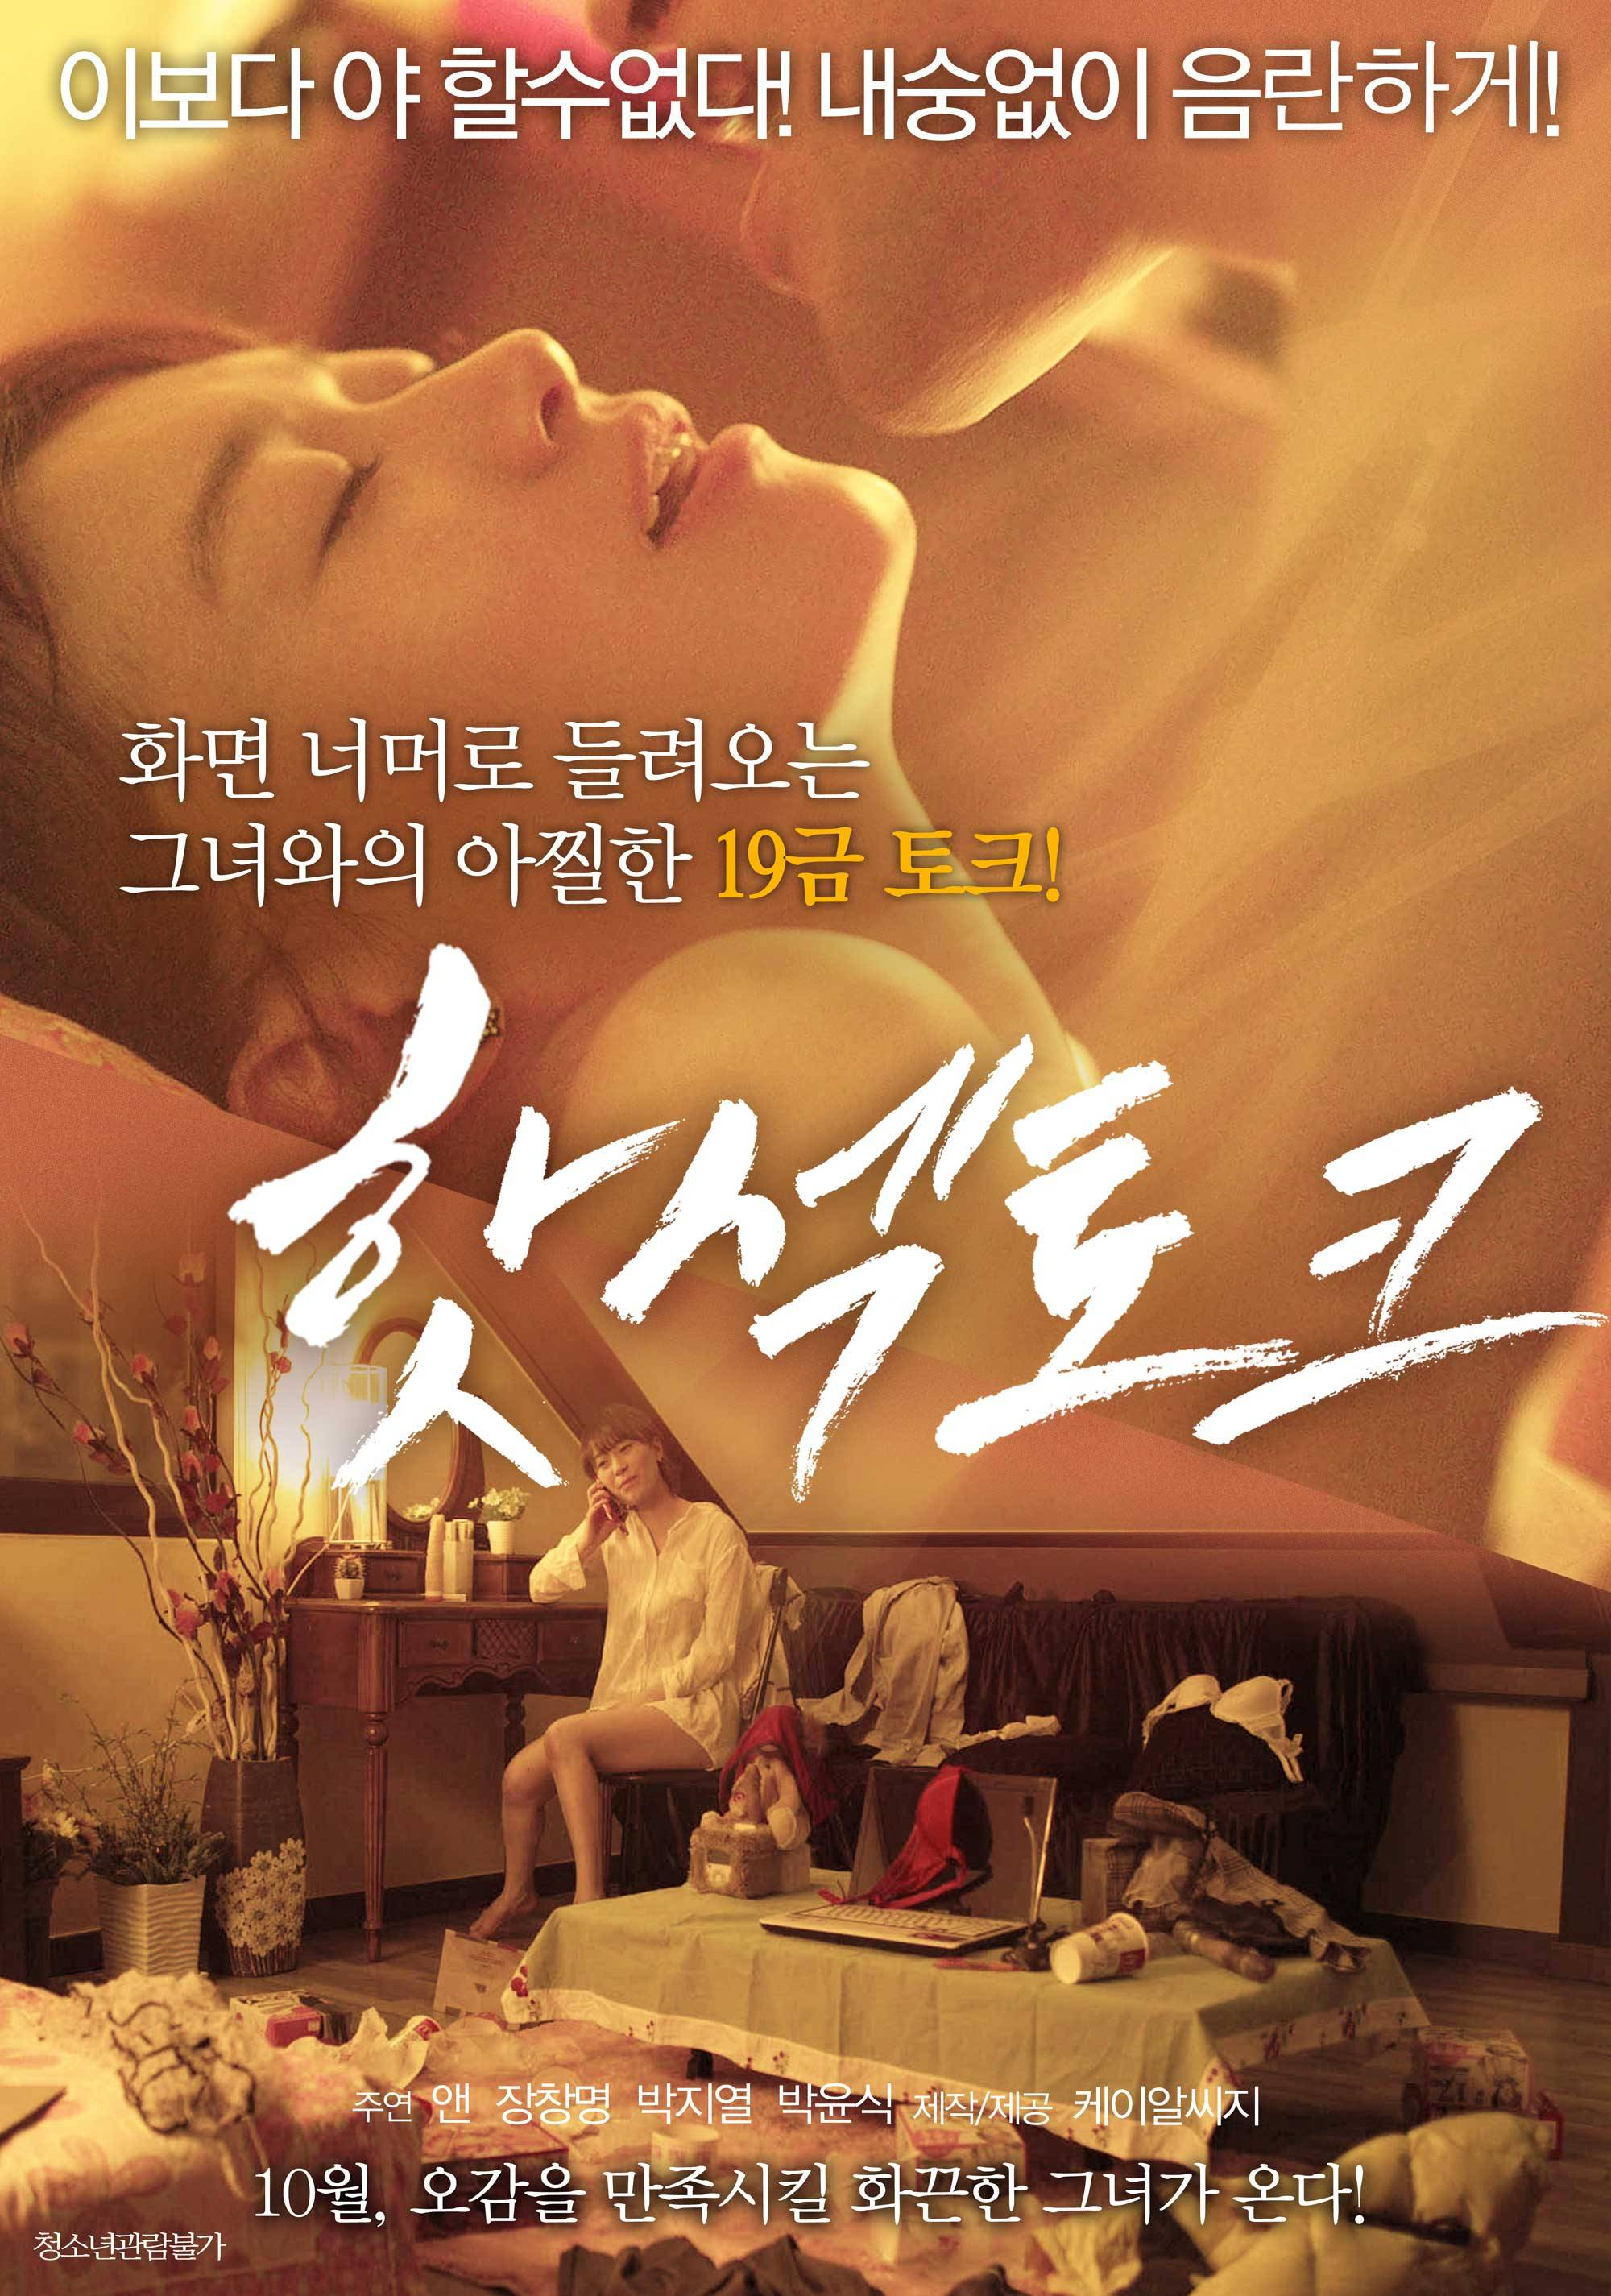 Korean Semi Sex